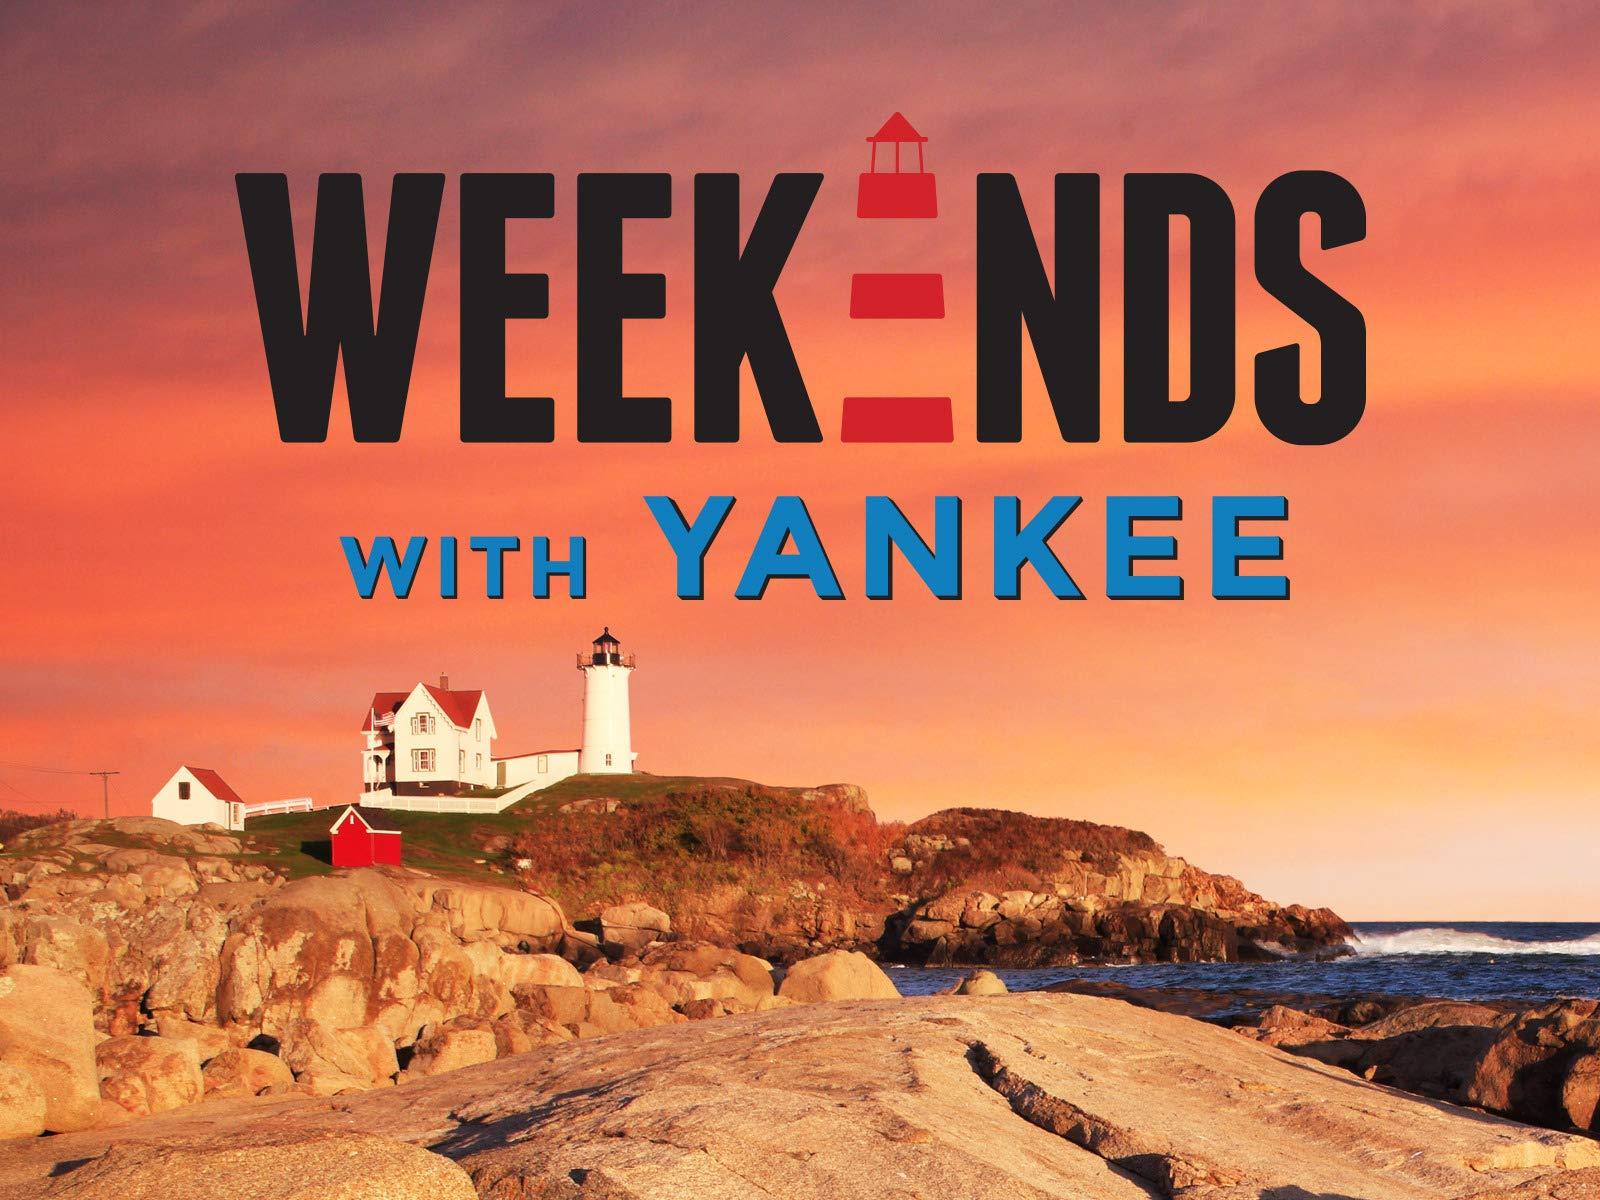 Amazon com: Watch Weekends with Yankee Season 1 | Prime Video